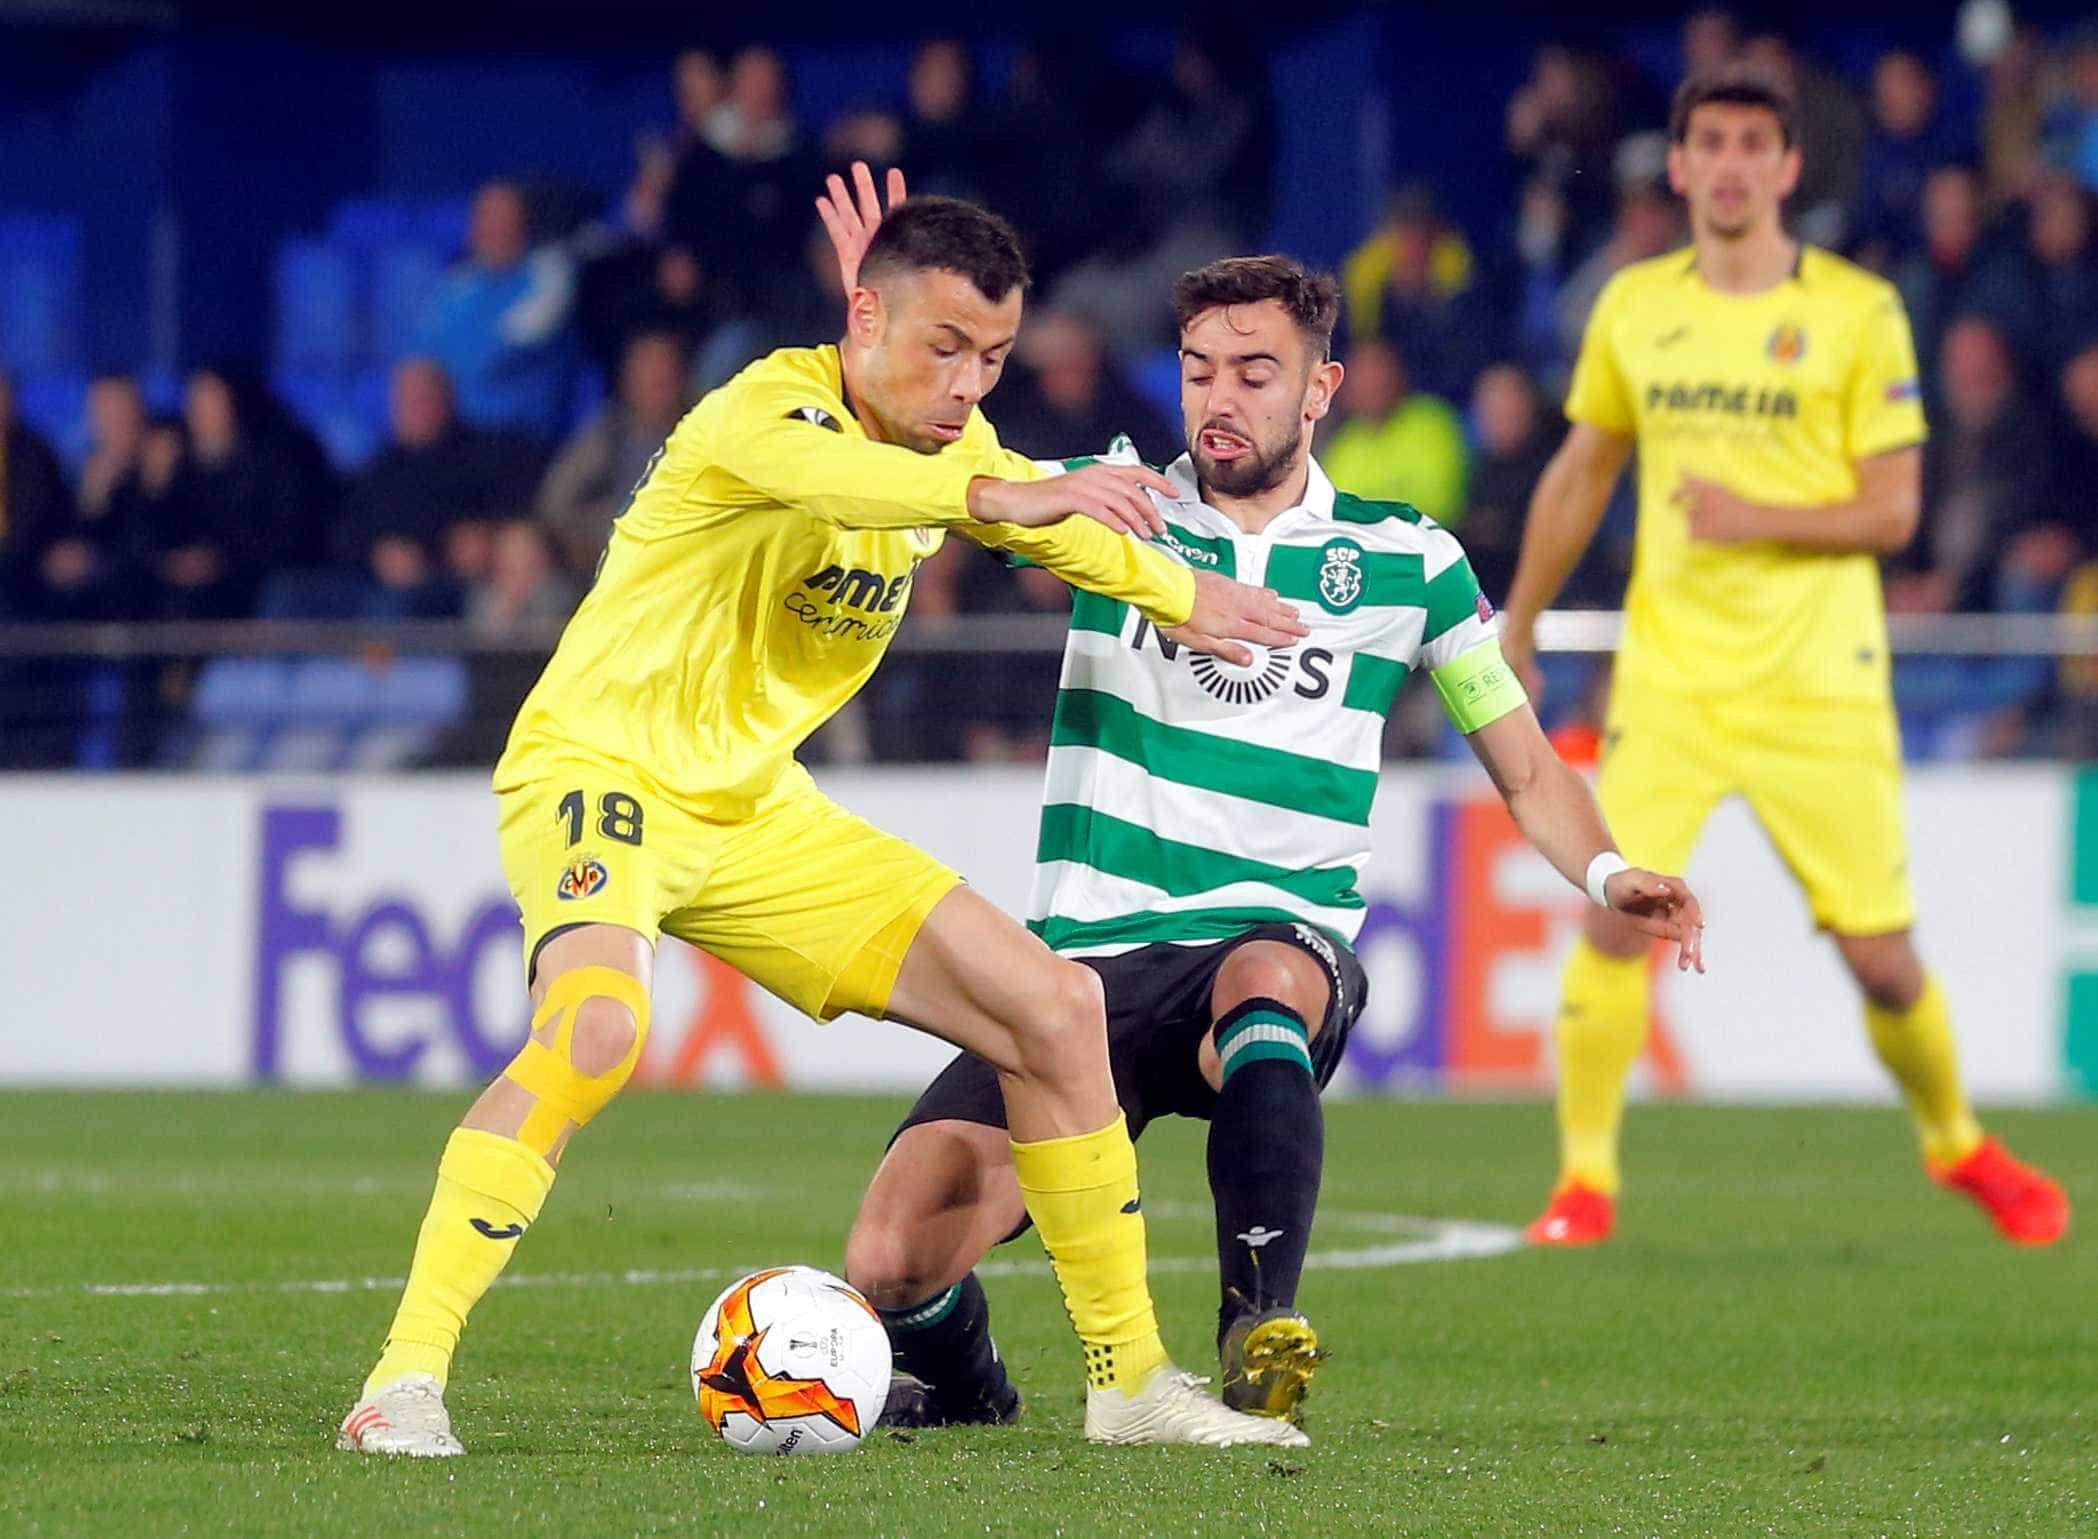 [0-1] Villarreal-Sporting: Expulsão. Segundo amarelo para Jefferson